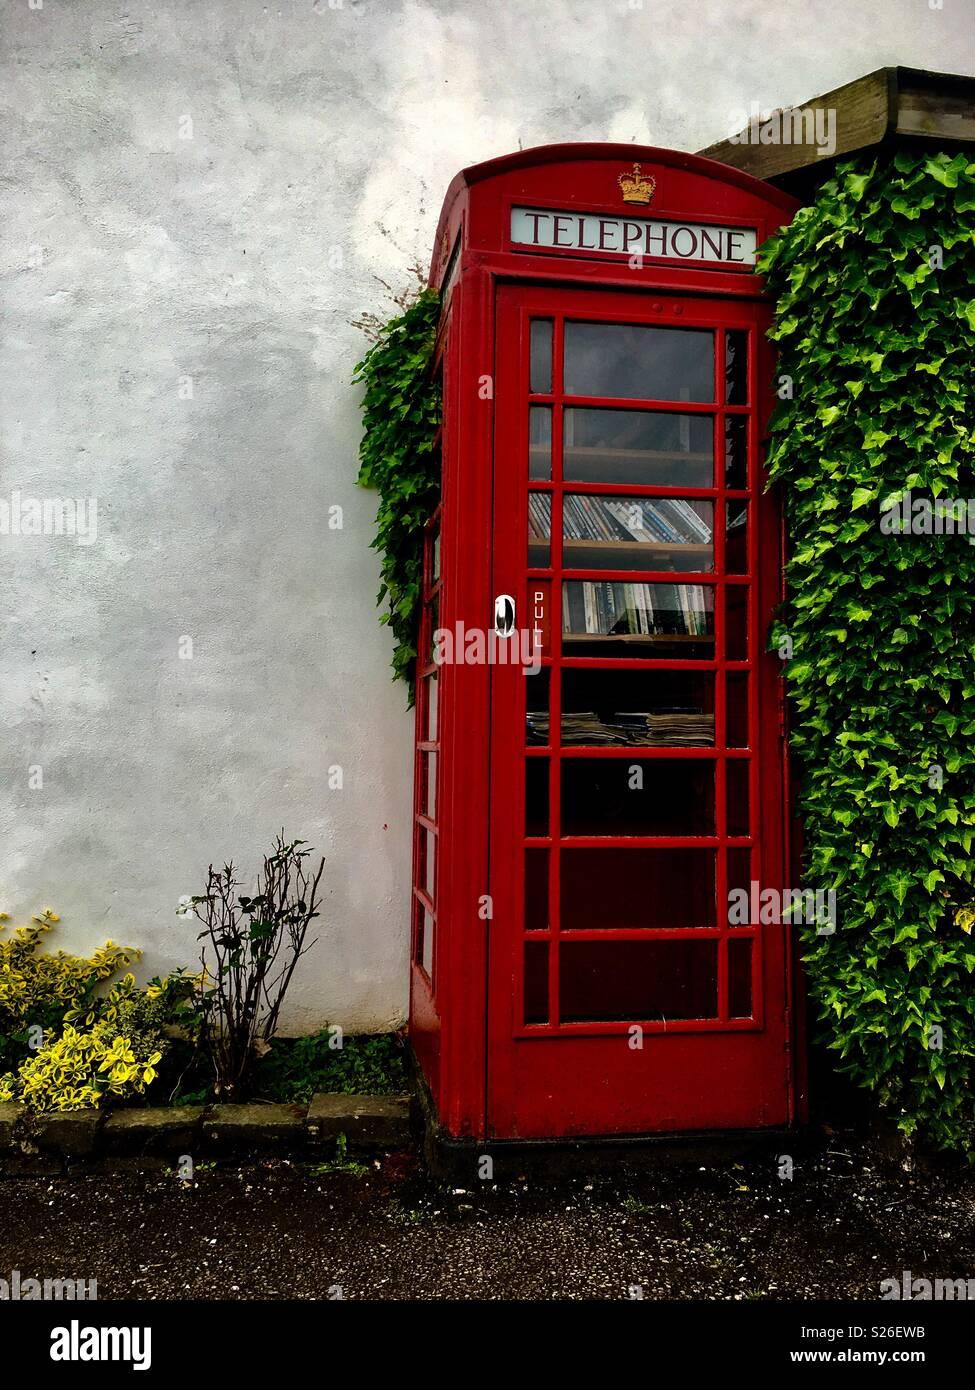 Phone Booth Lake District, England Stockbild